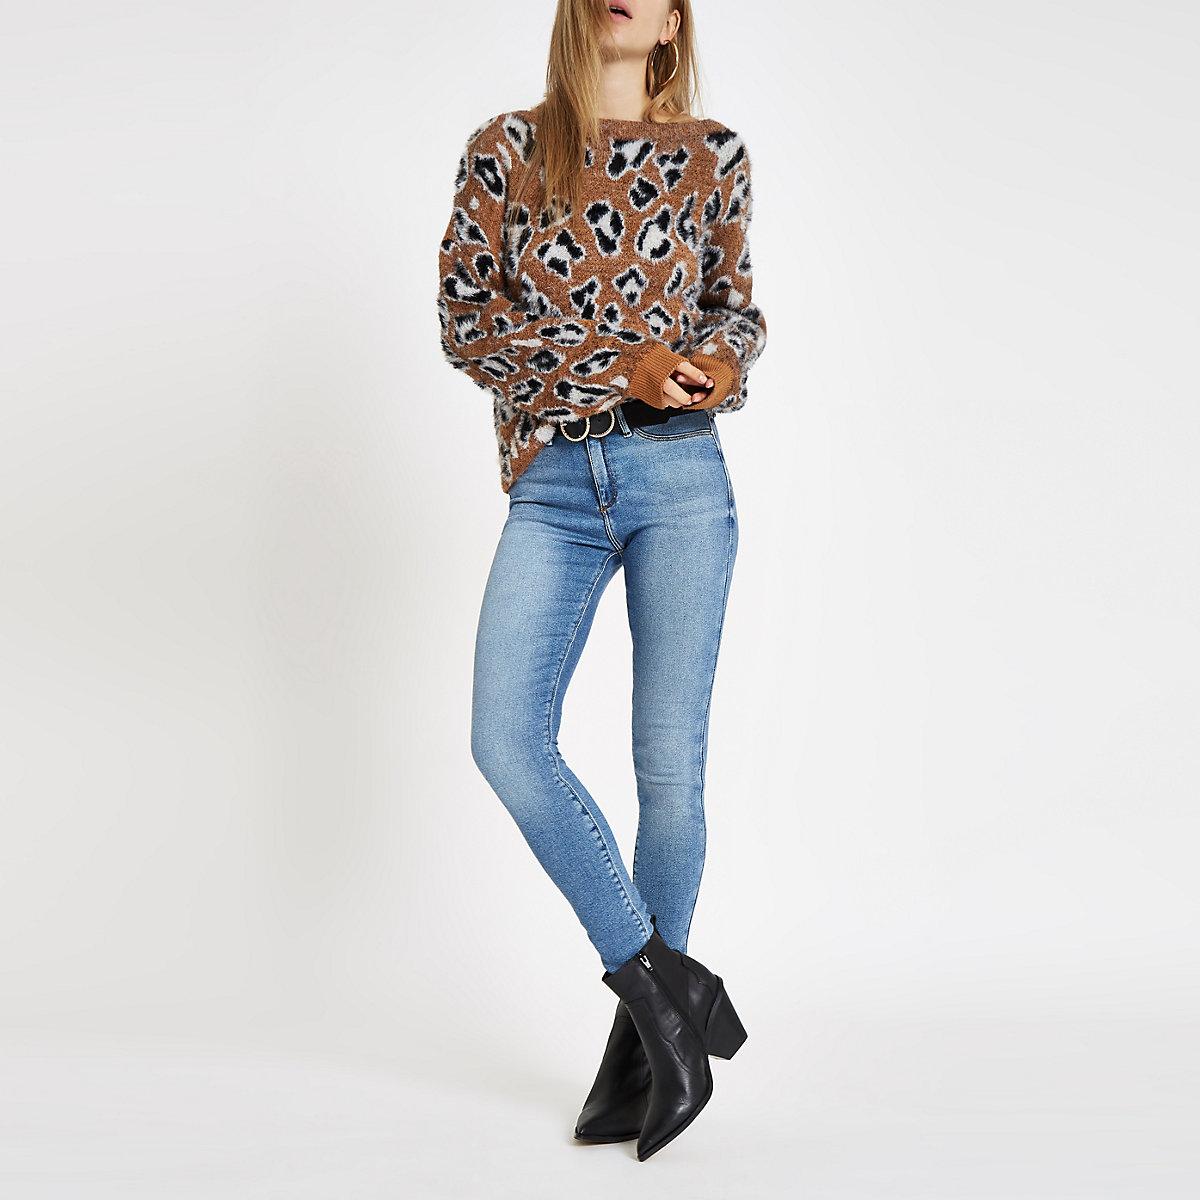 4ed84d634d2f Brauner Pullover mit Leopardenprint Brauner Pullover mit Leopardenprint  Brauner Pullover mit Leopardenprint ...